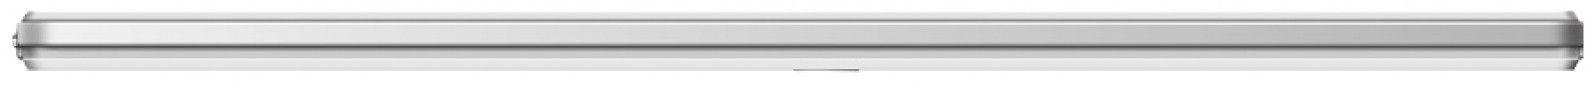 Планшет Prestigio MultiPad 4 Diamond 10.1 3G White (PMT7177_3G_D_WH) 4